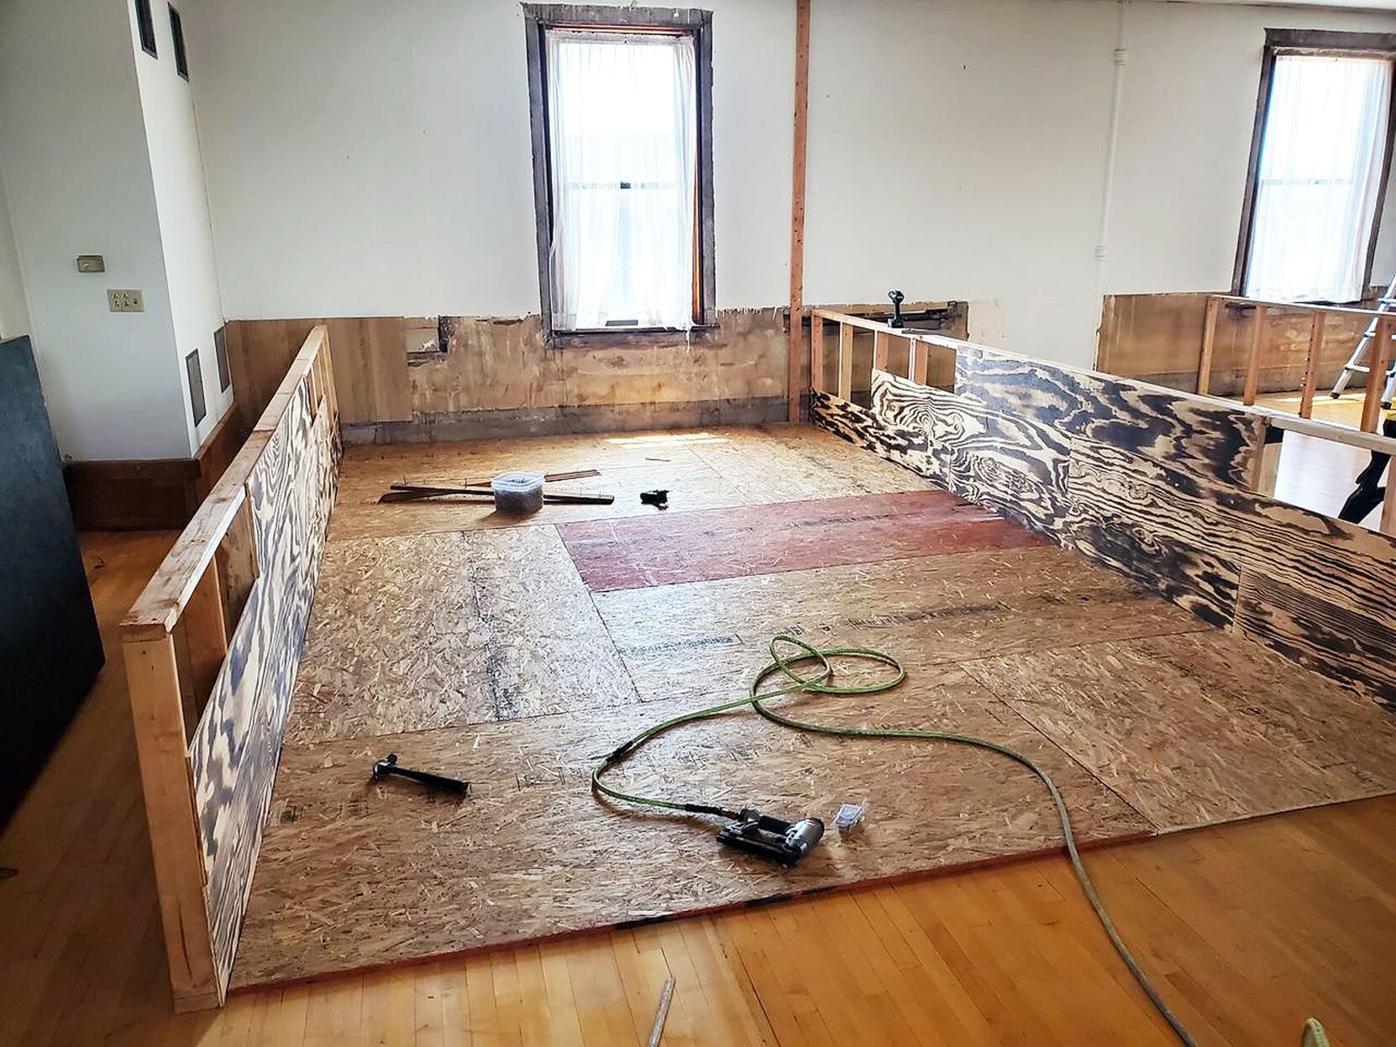 Elks building goes through changes